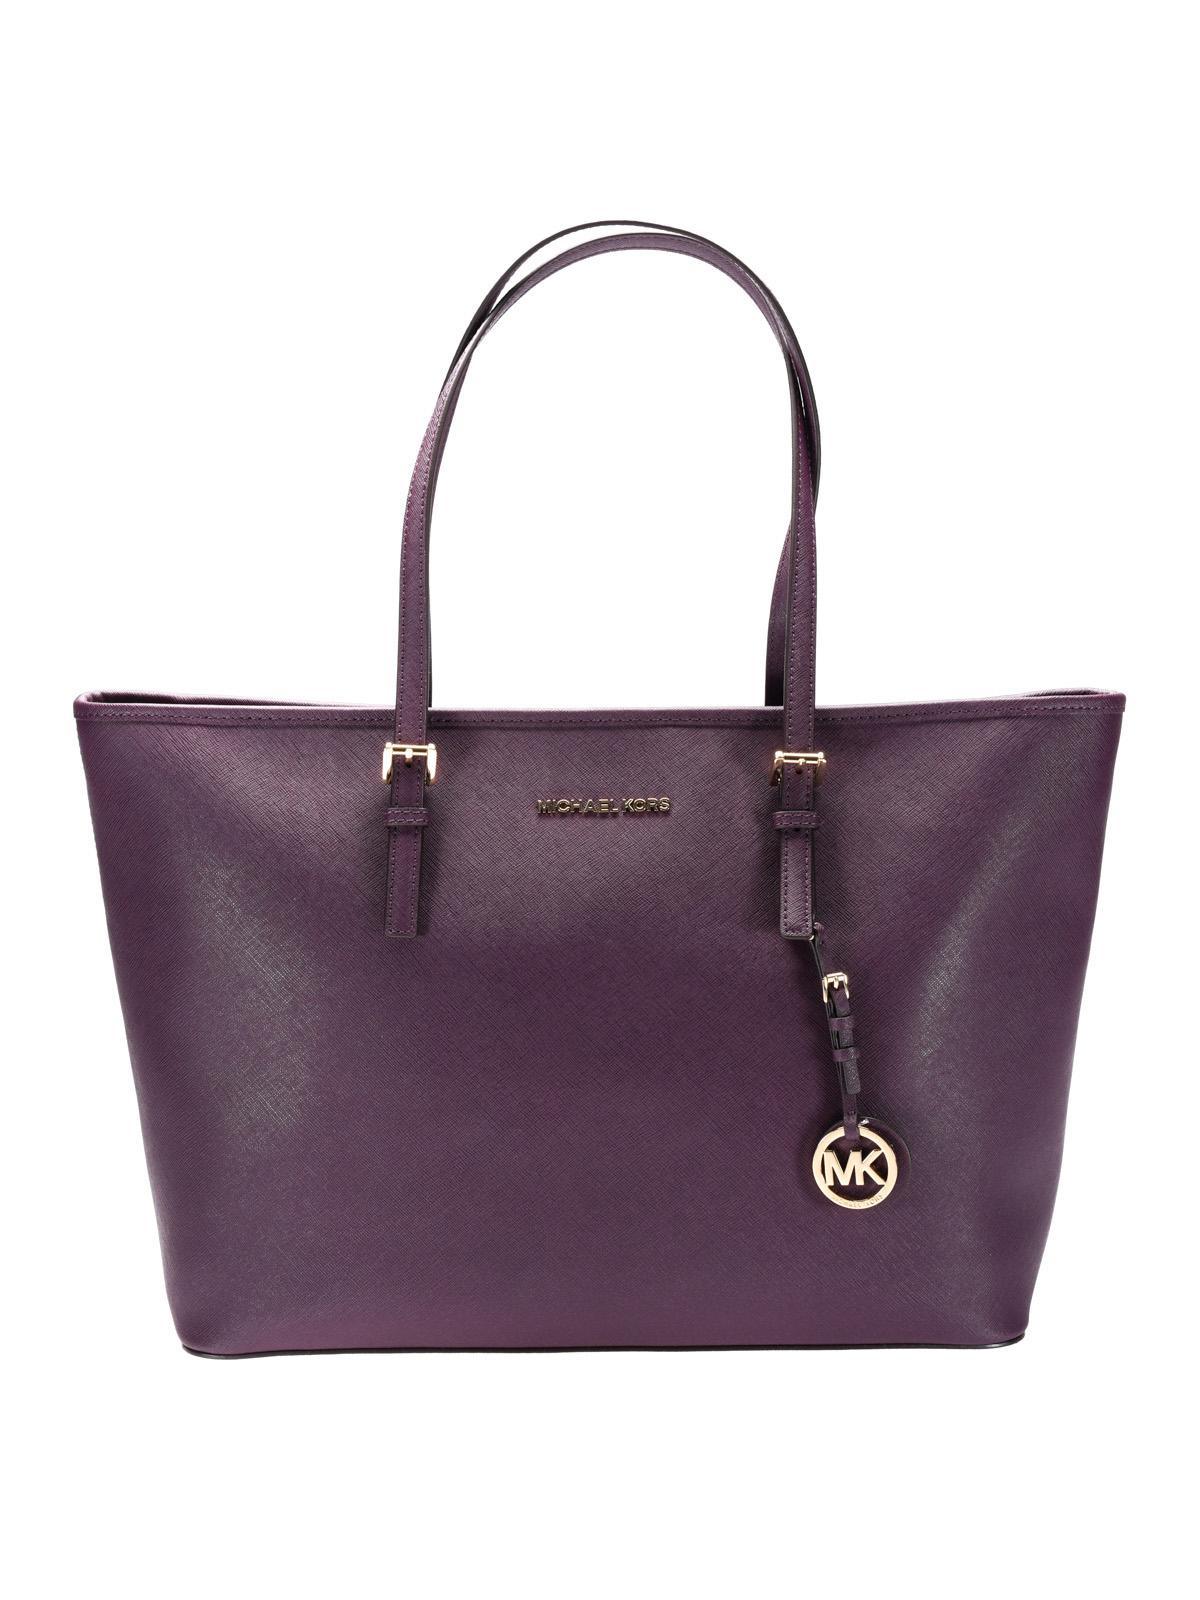 jet set travel purple tote by michael kors totes bags ikrix. Black Bedroom Furniture Sets. Home Design Ideas